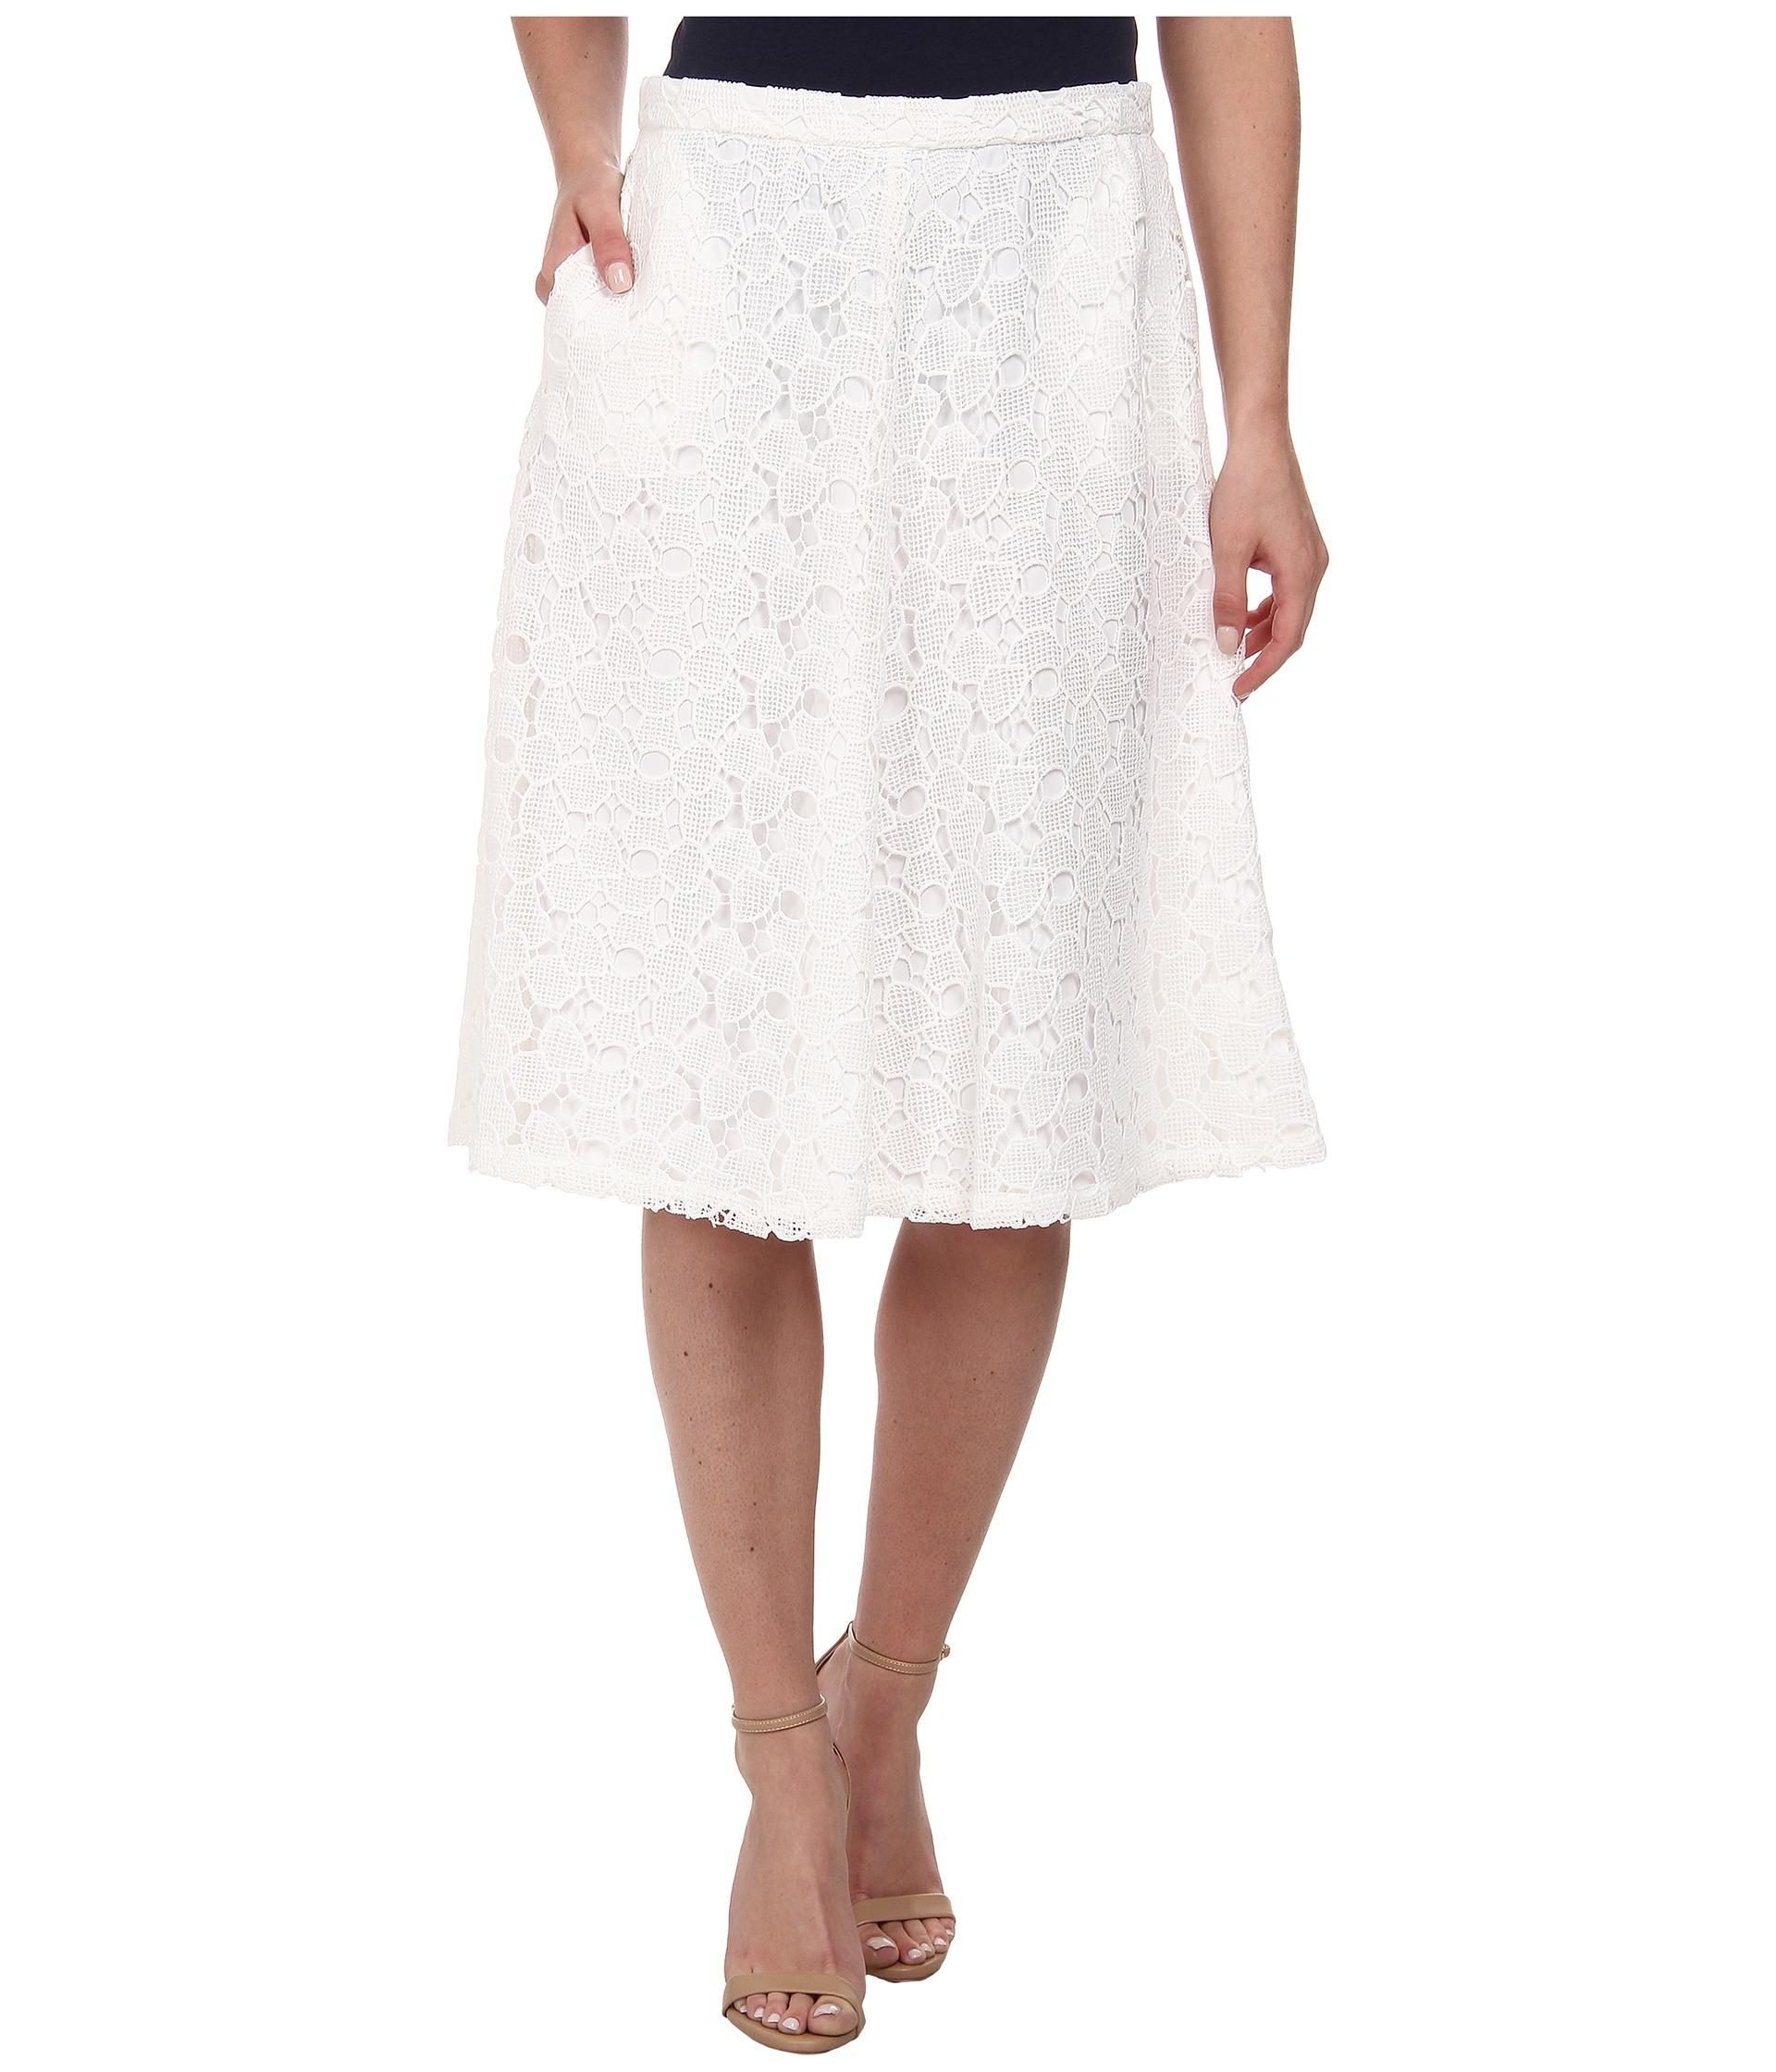 5d2fc6abe9 Calvin Klein Lace Midi Skirt in White - Lyst